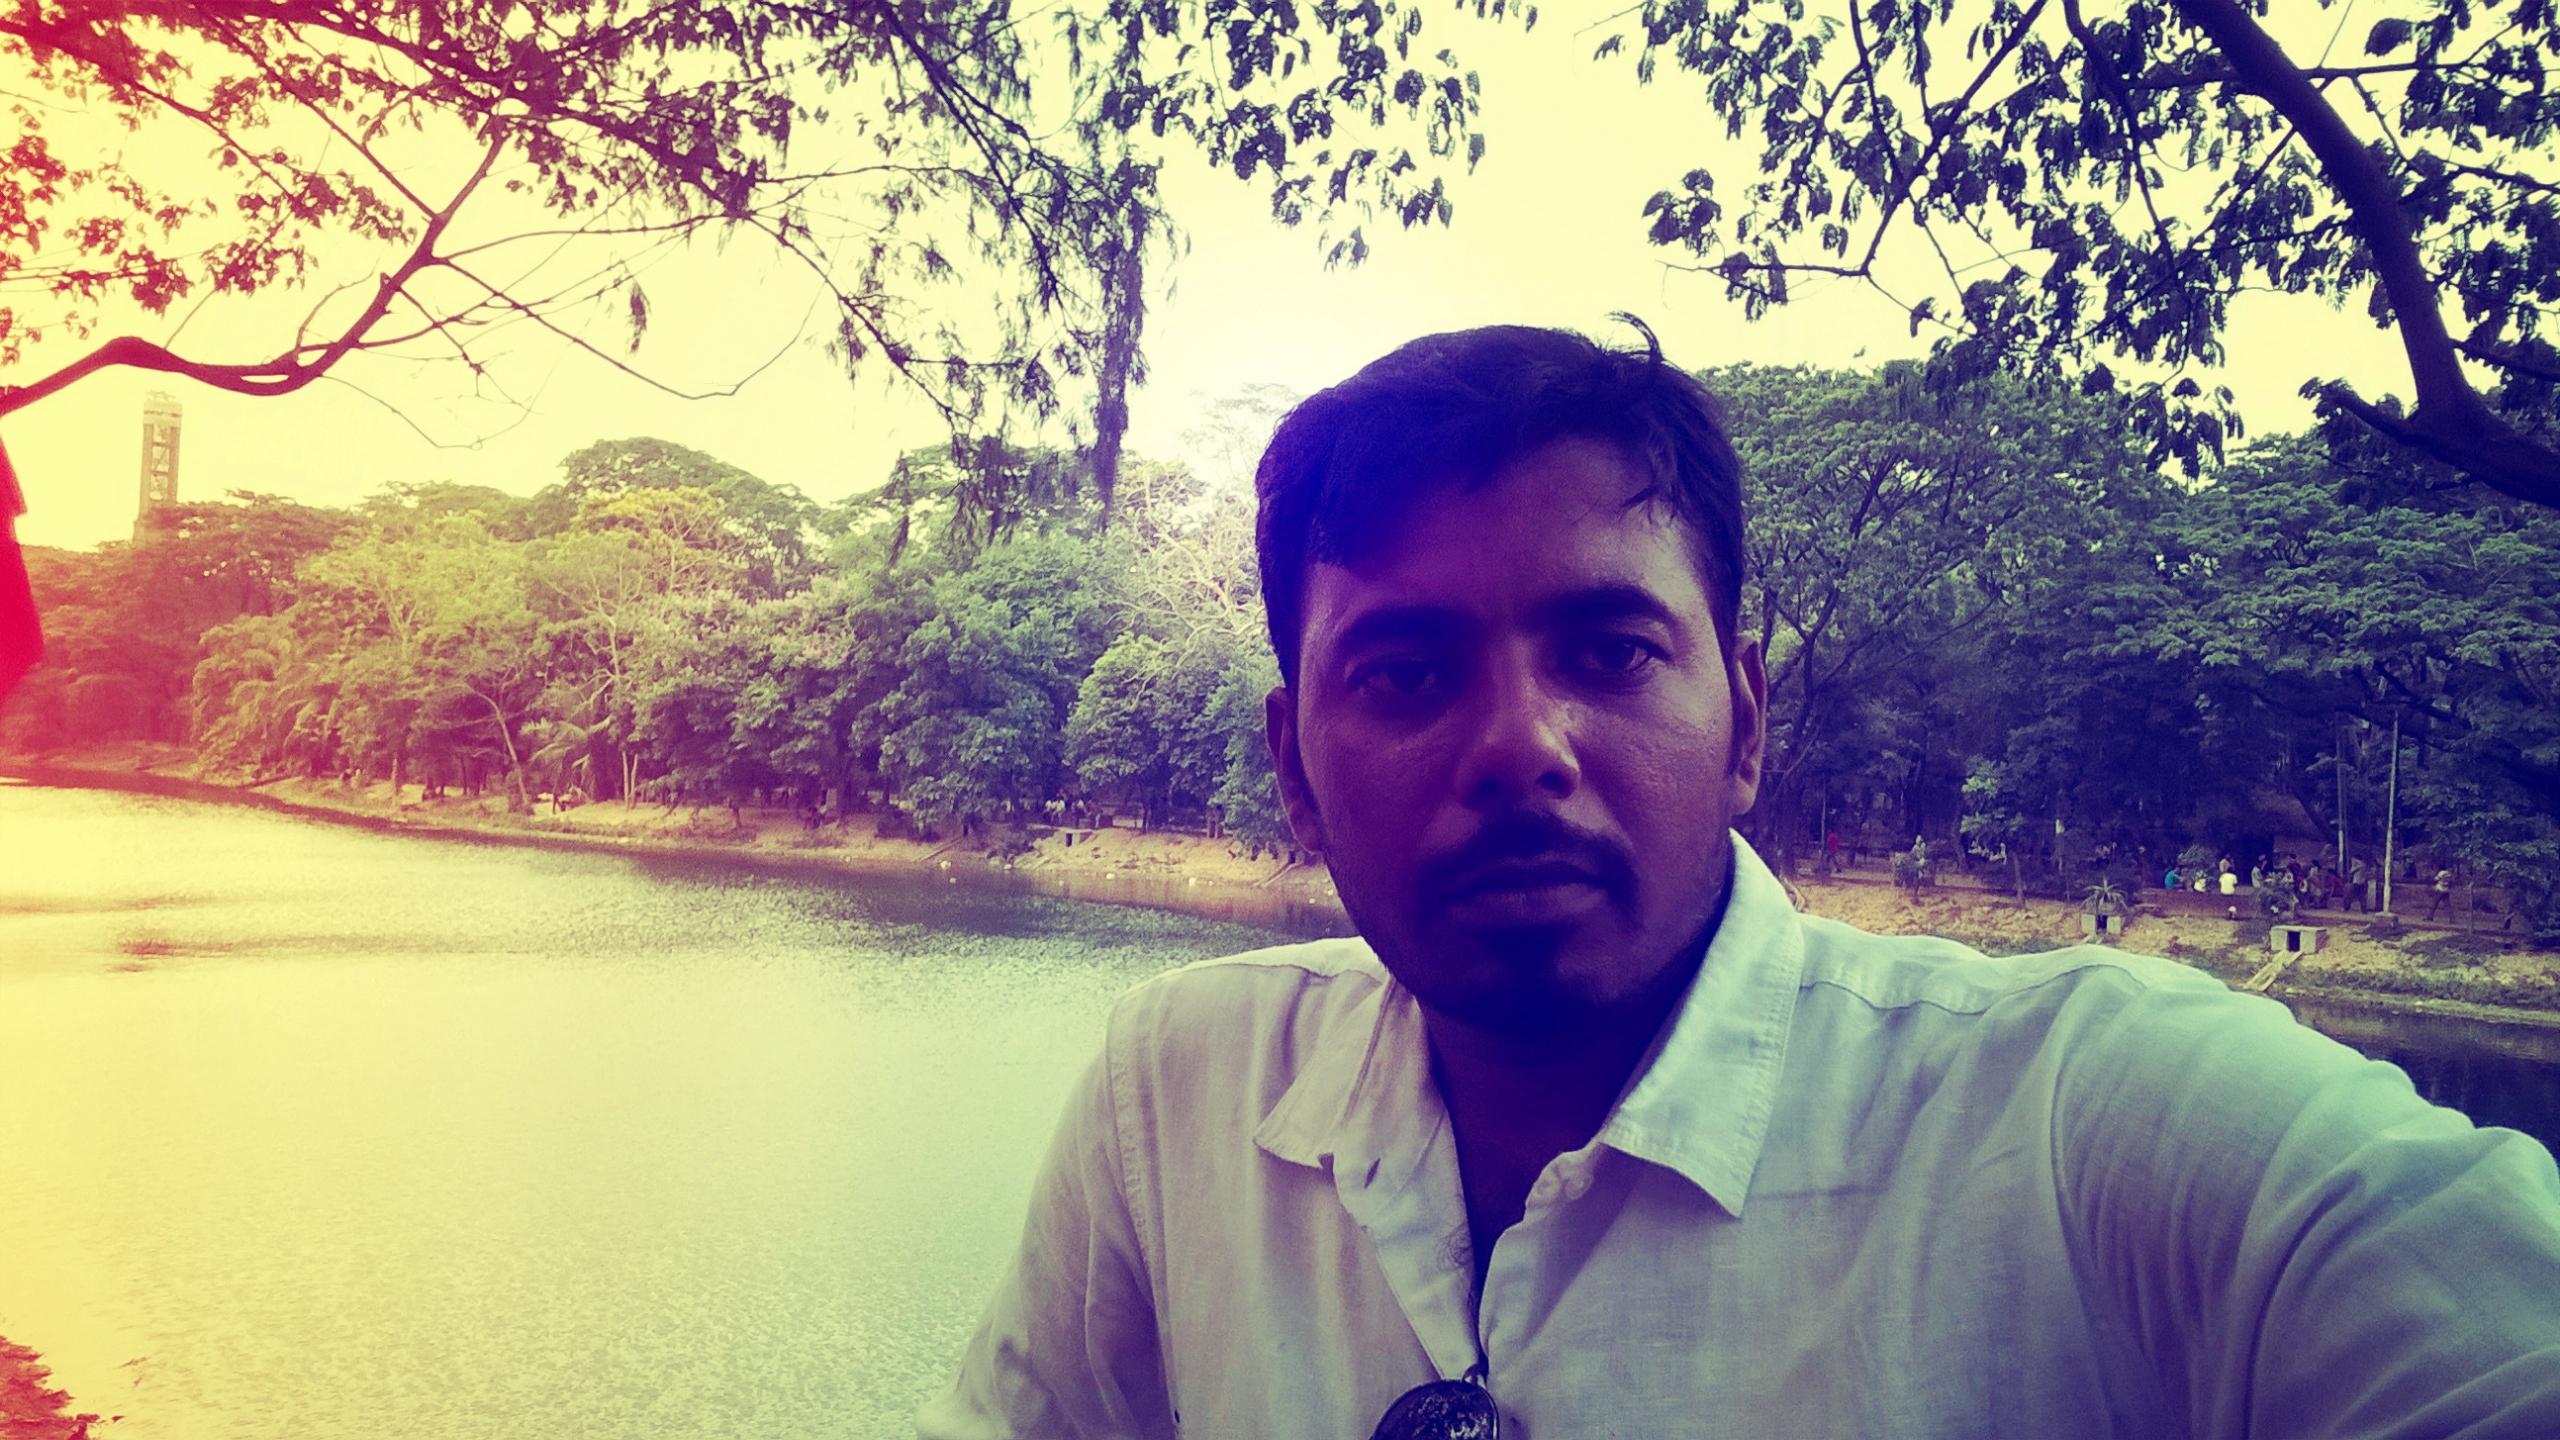 @jashimsheikh Cover Image